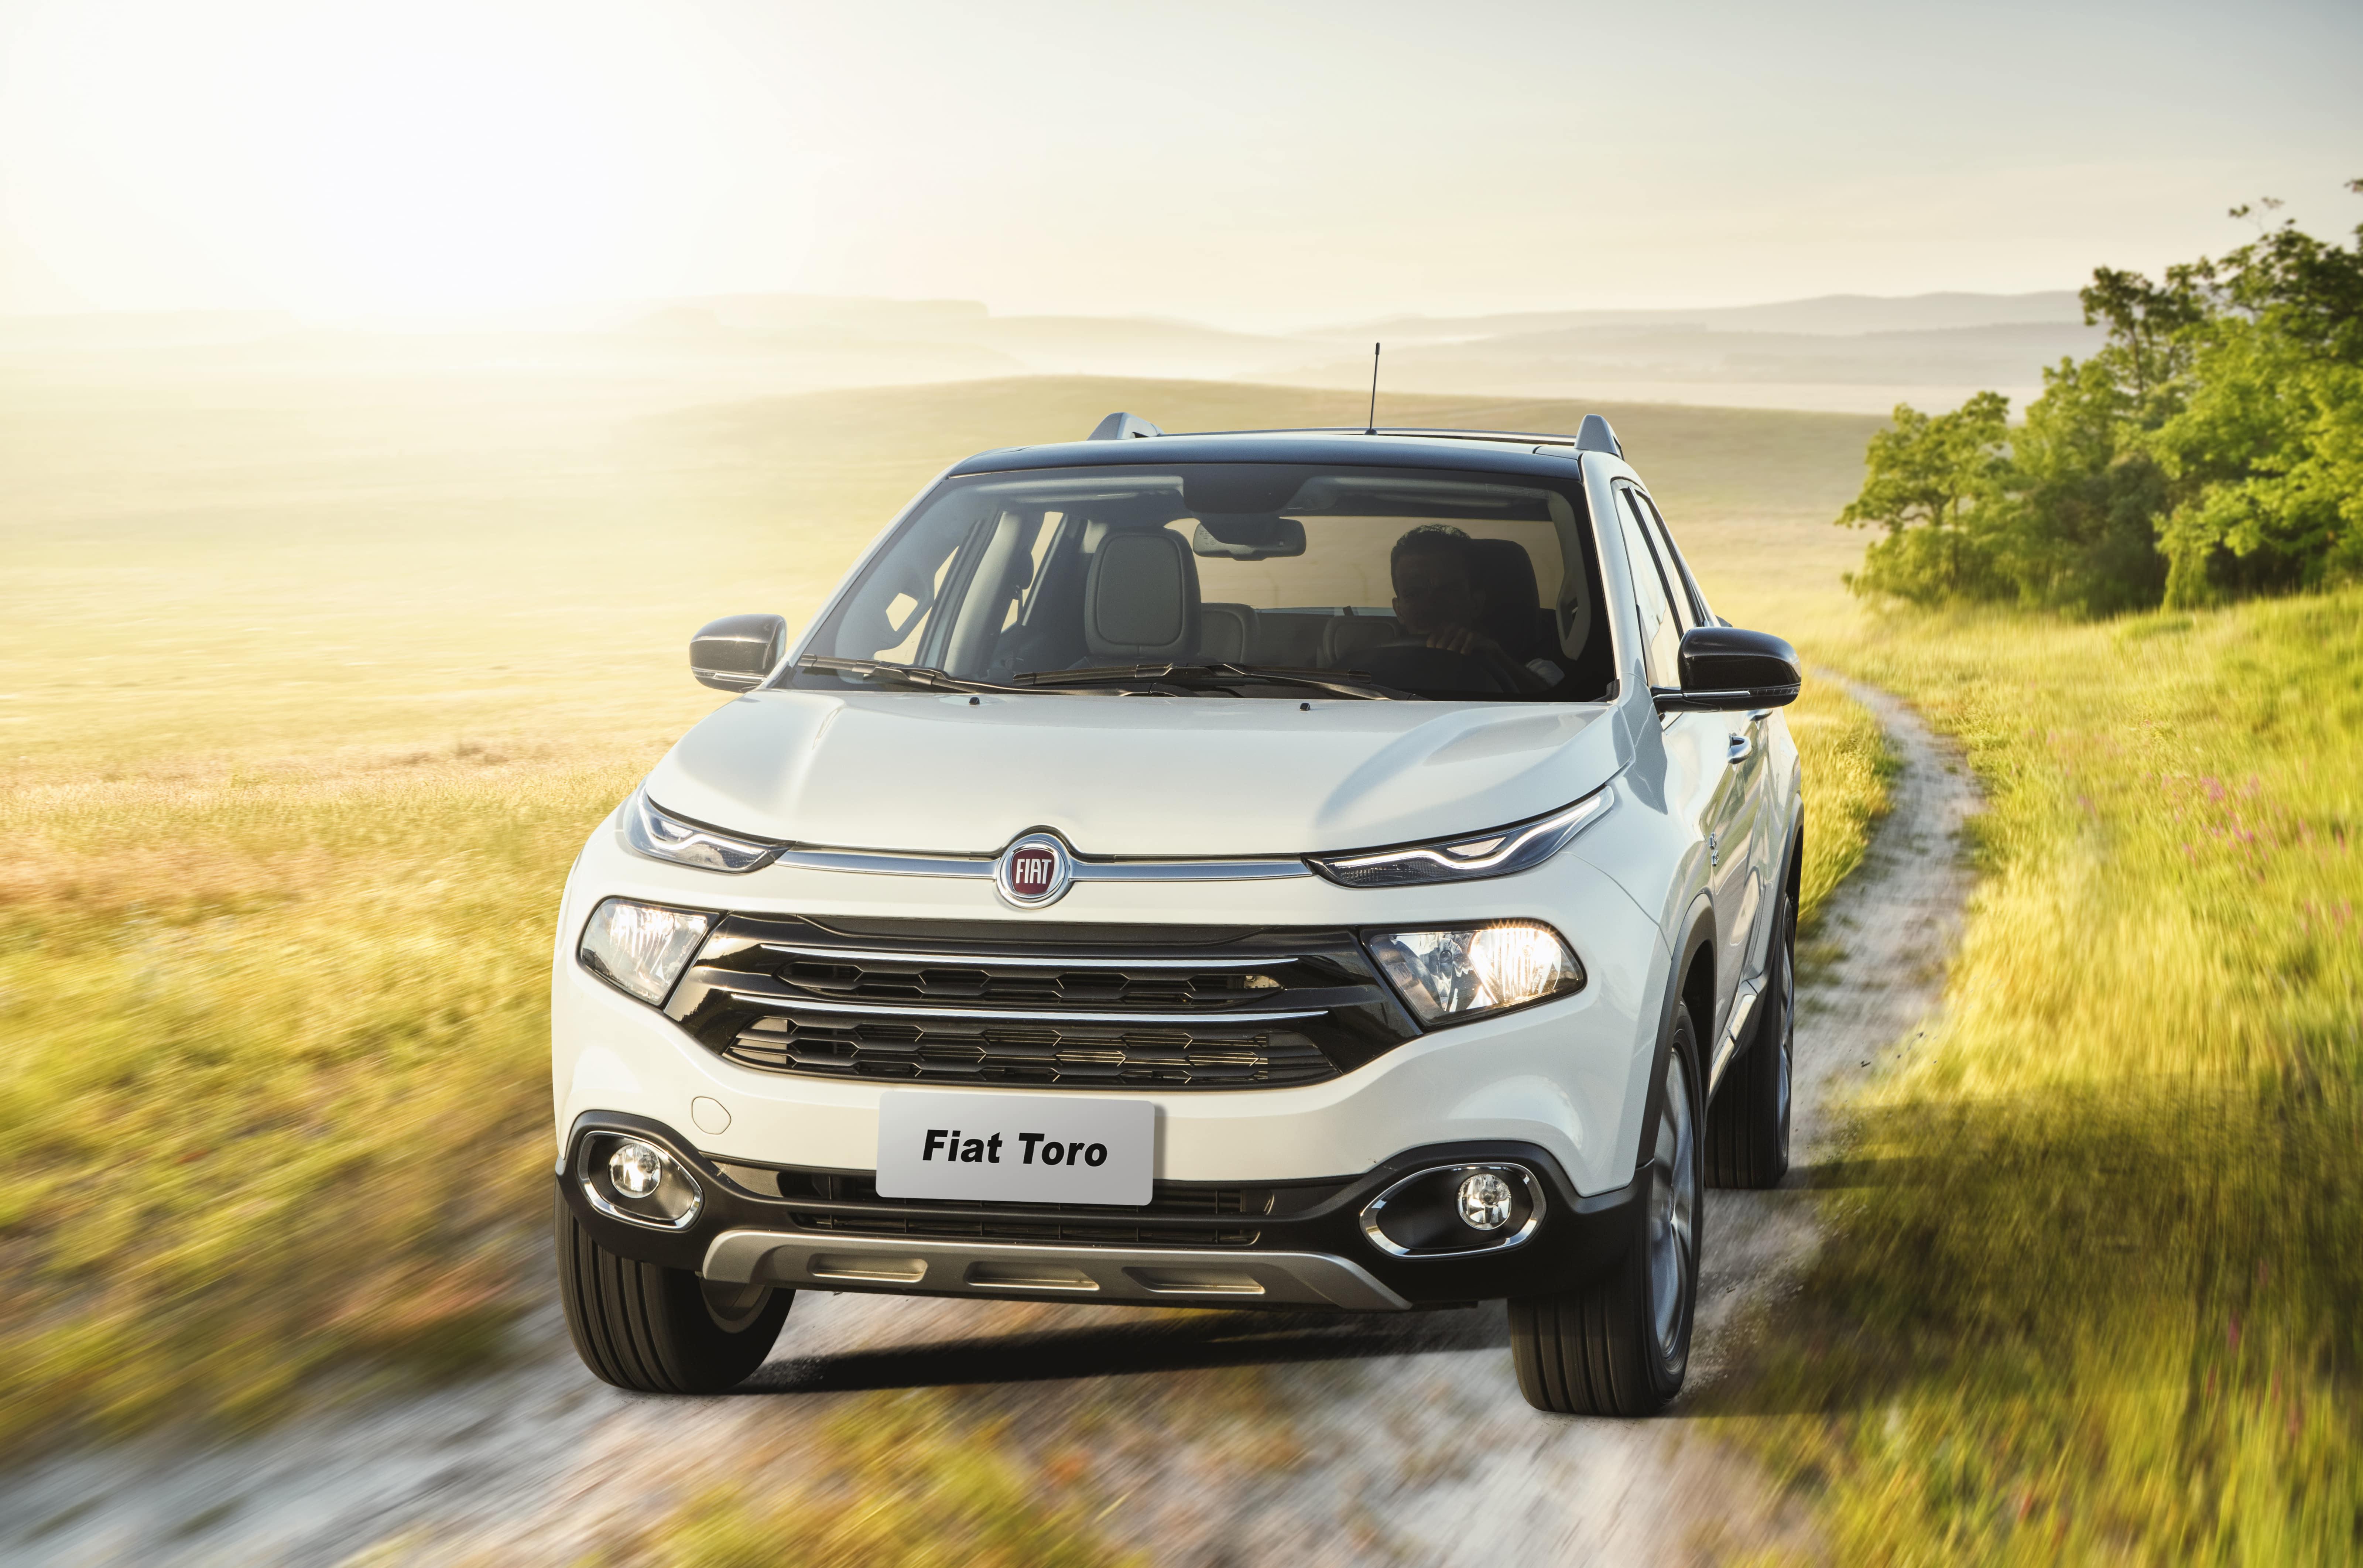 Fiat Toro Volcano 2.4 Flex 2019